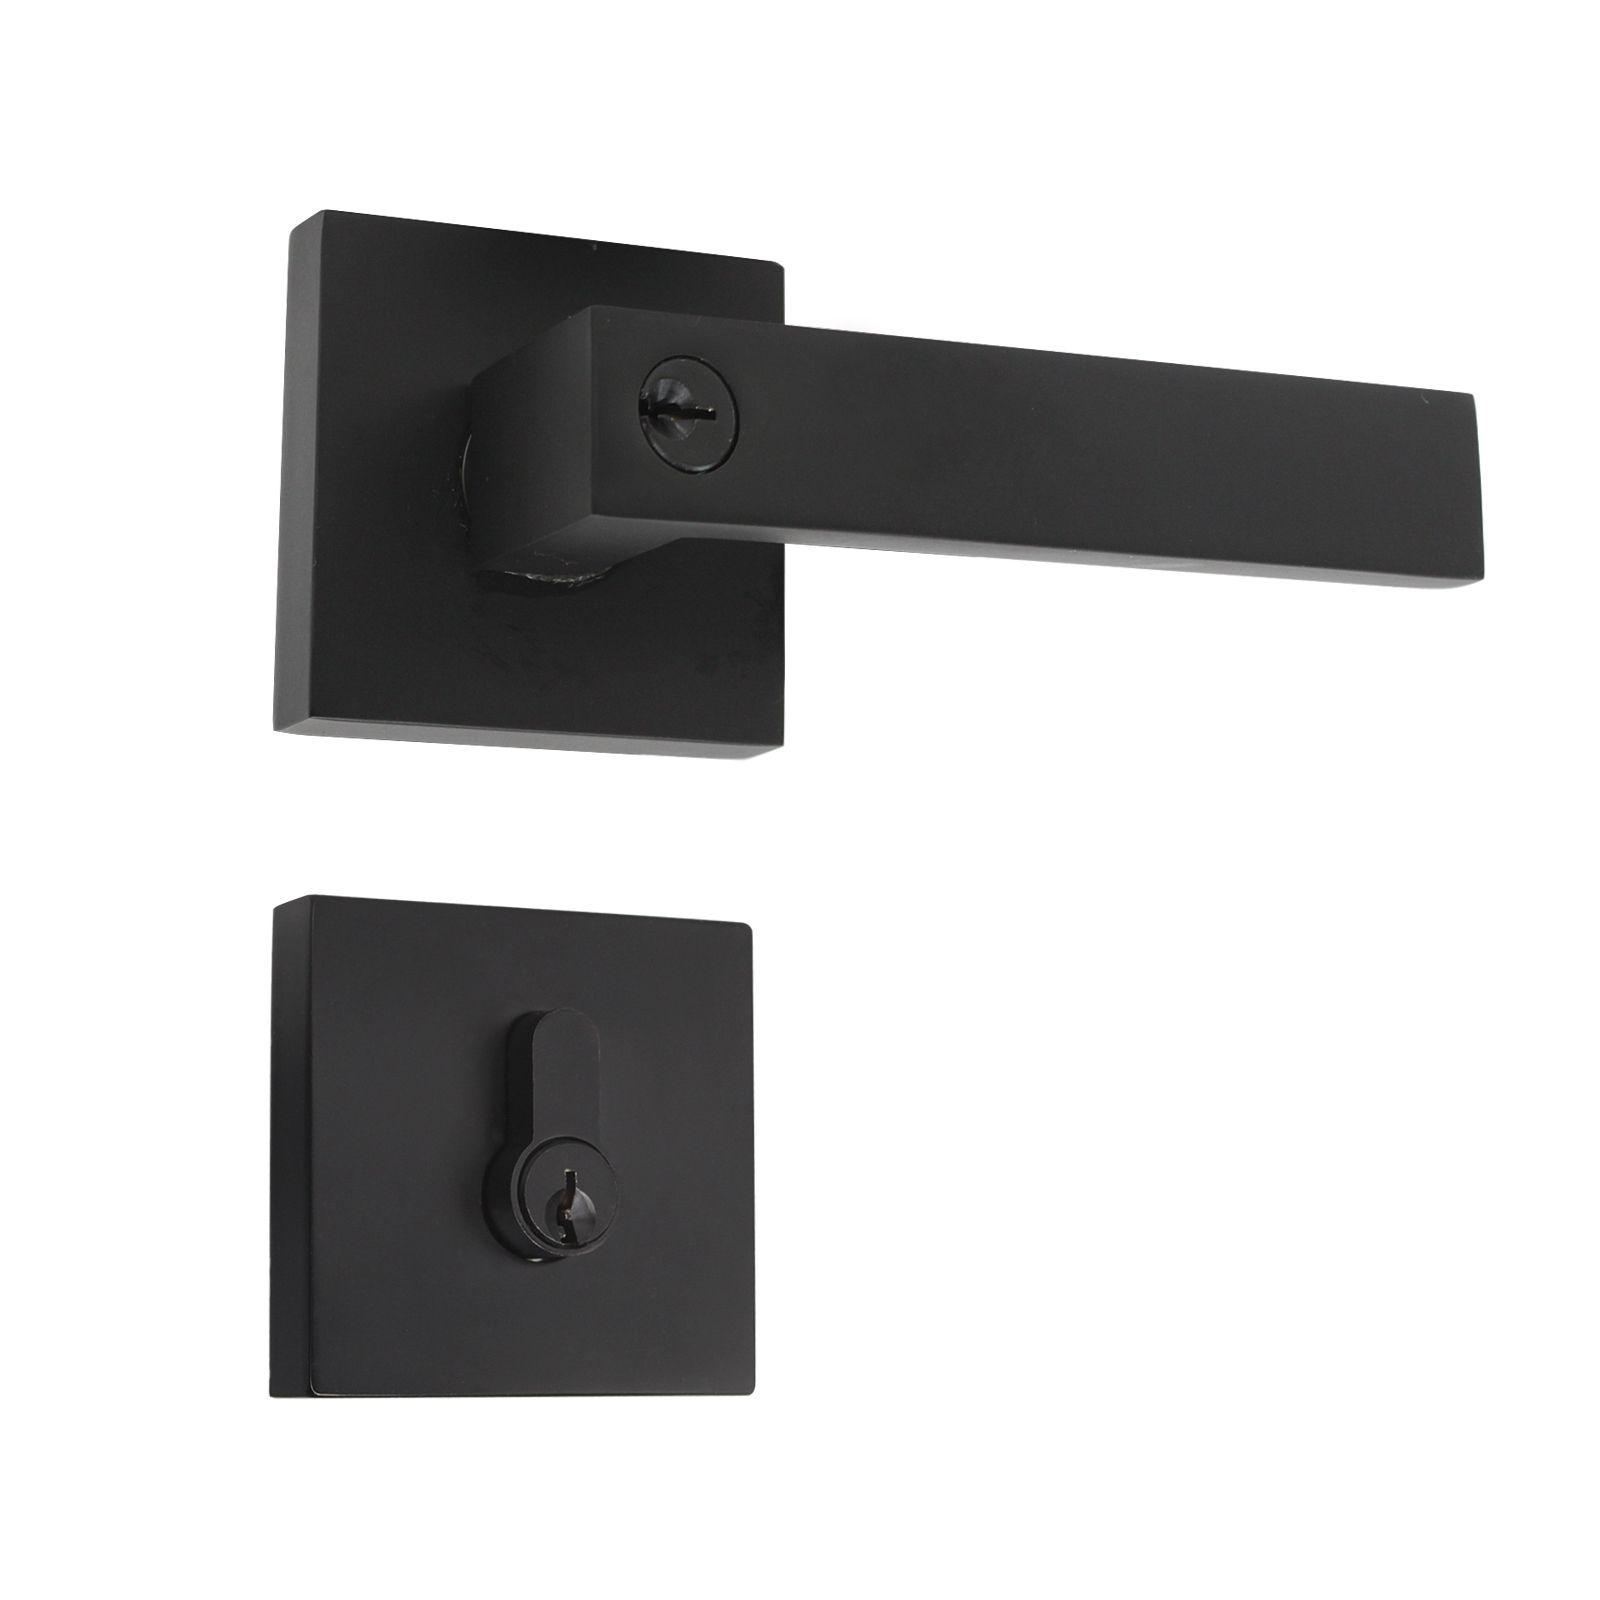 Exterior Lockset Handleset Probrico Entry Door Levers Black,Keyed Entrance Lock for Front and Back Door Universal Handing,Euro Mortise Lock